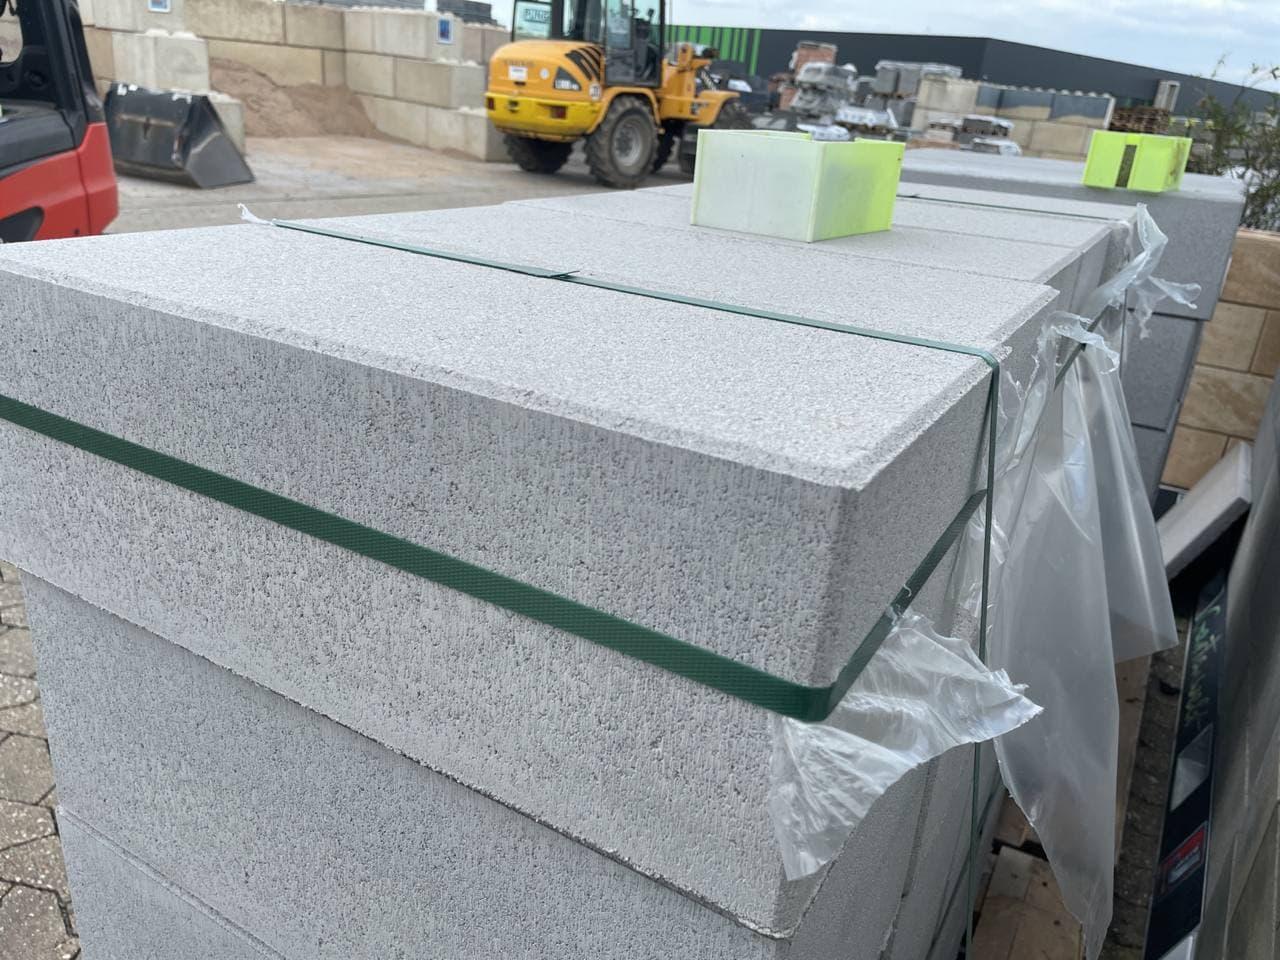 Vios Mauer Grundelement  45×22,5×16,5 cm  grau Rohling betonglatt ( 2.Wahl )